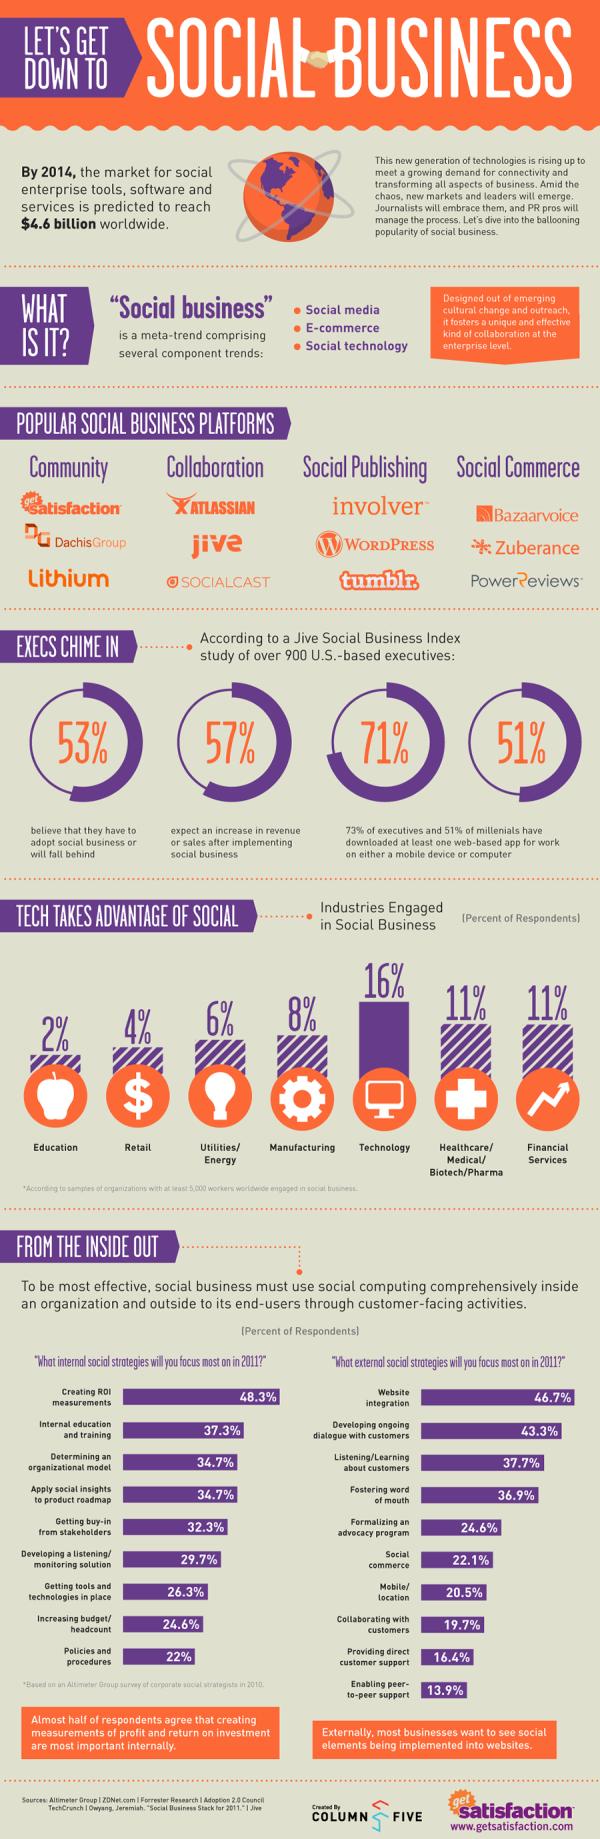 Social Business Explained resized 600